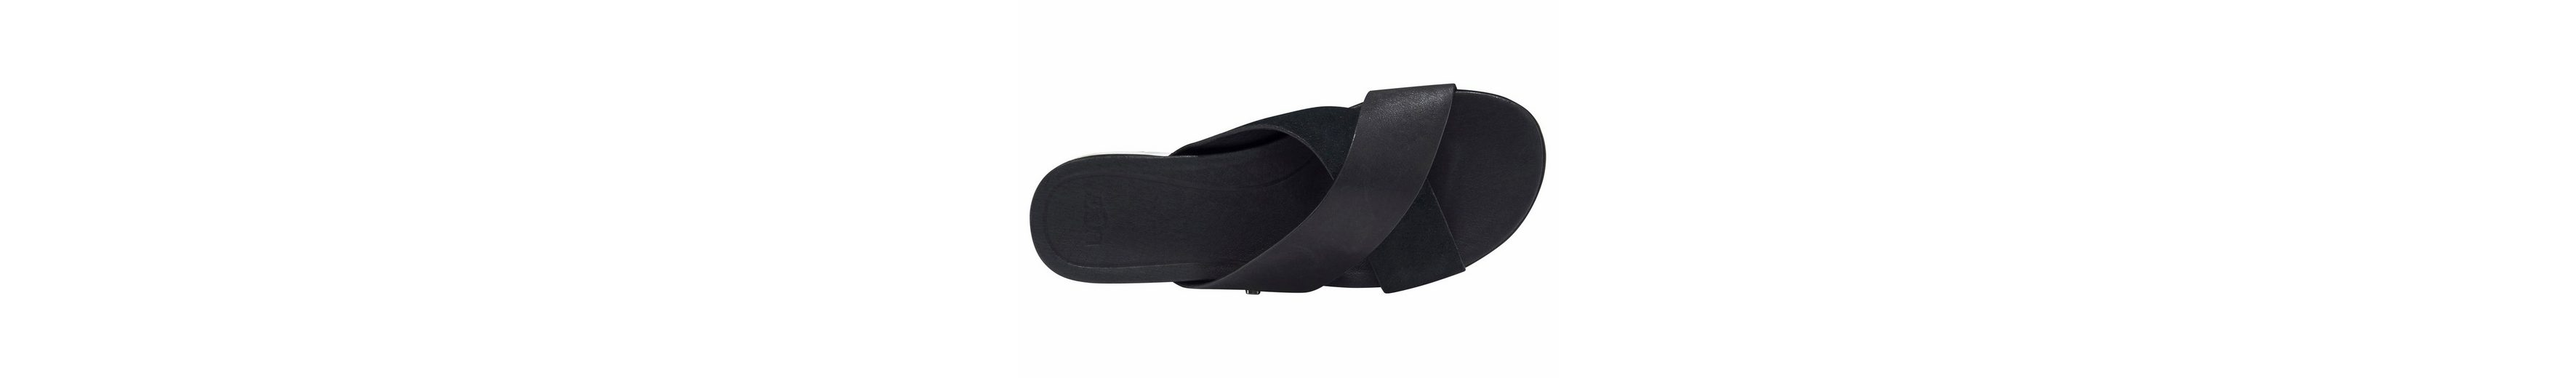 UGG Kari Pantolette, im Materialmix aus Leder und Velourleder